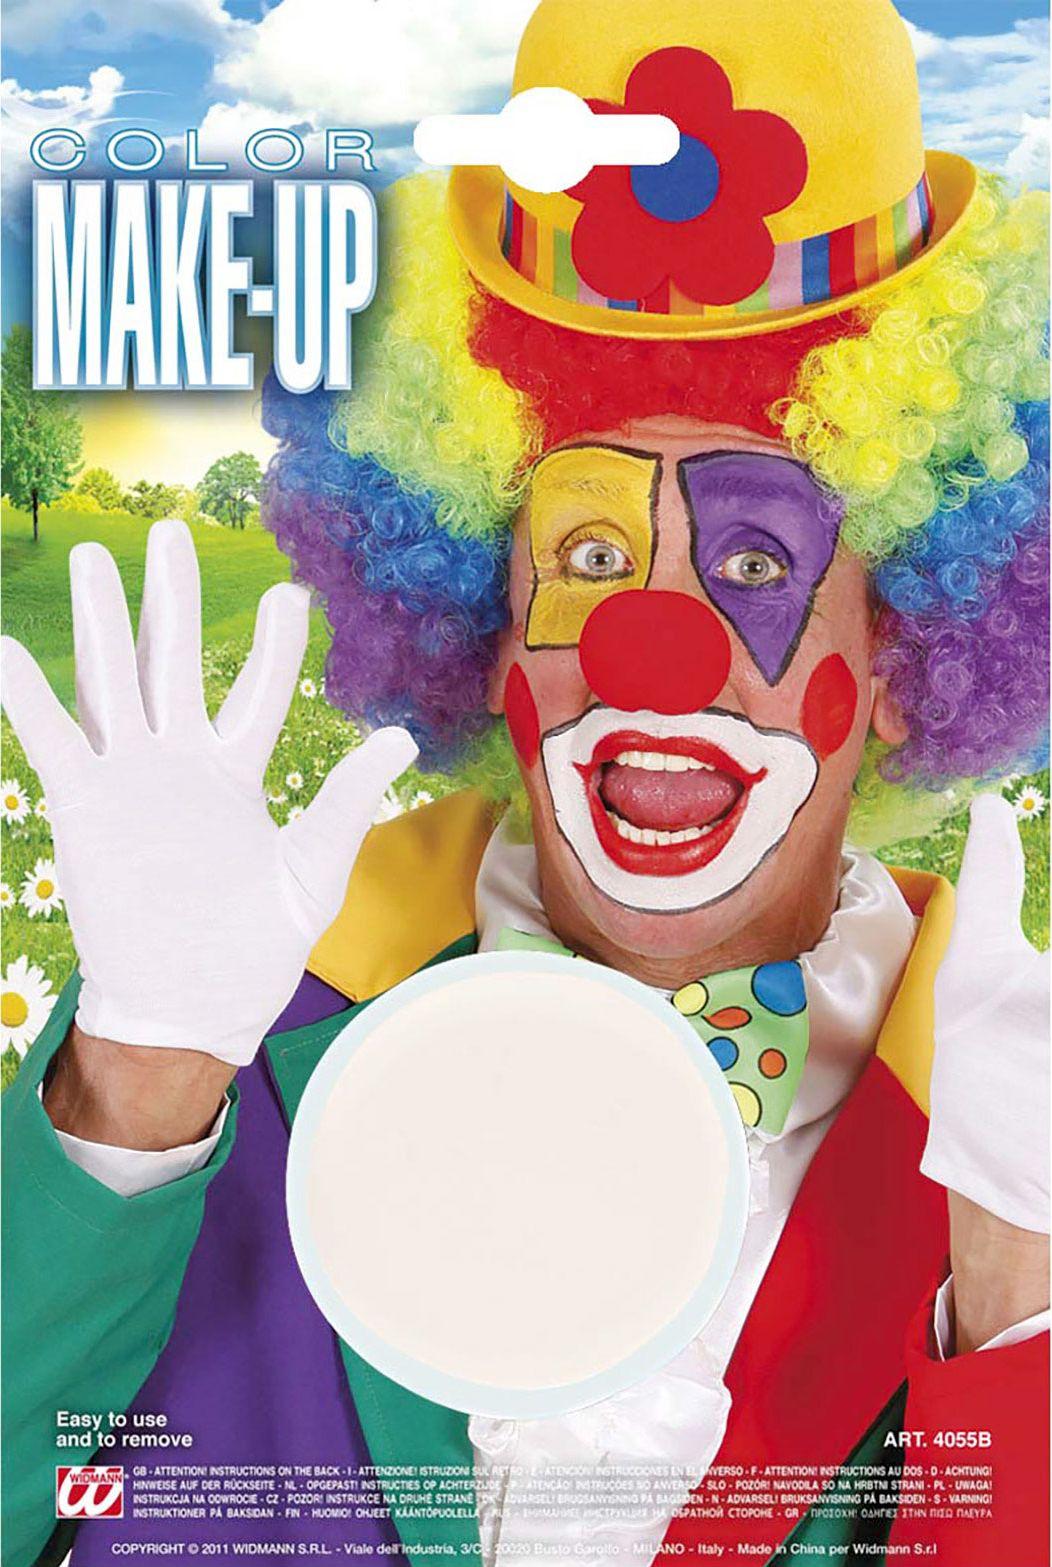 Witte make-up